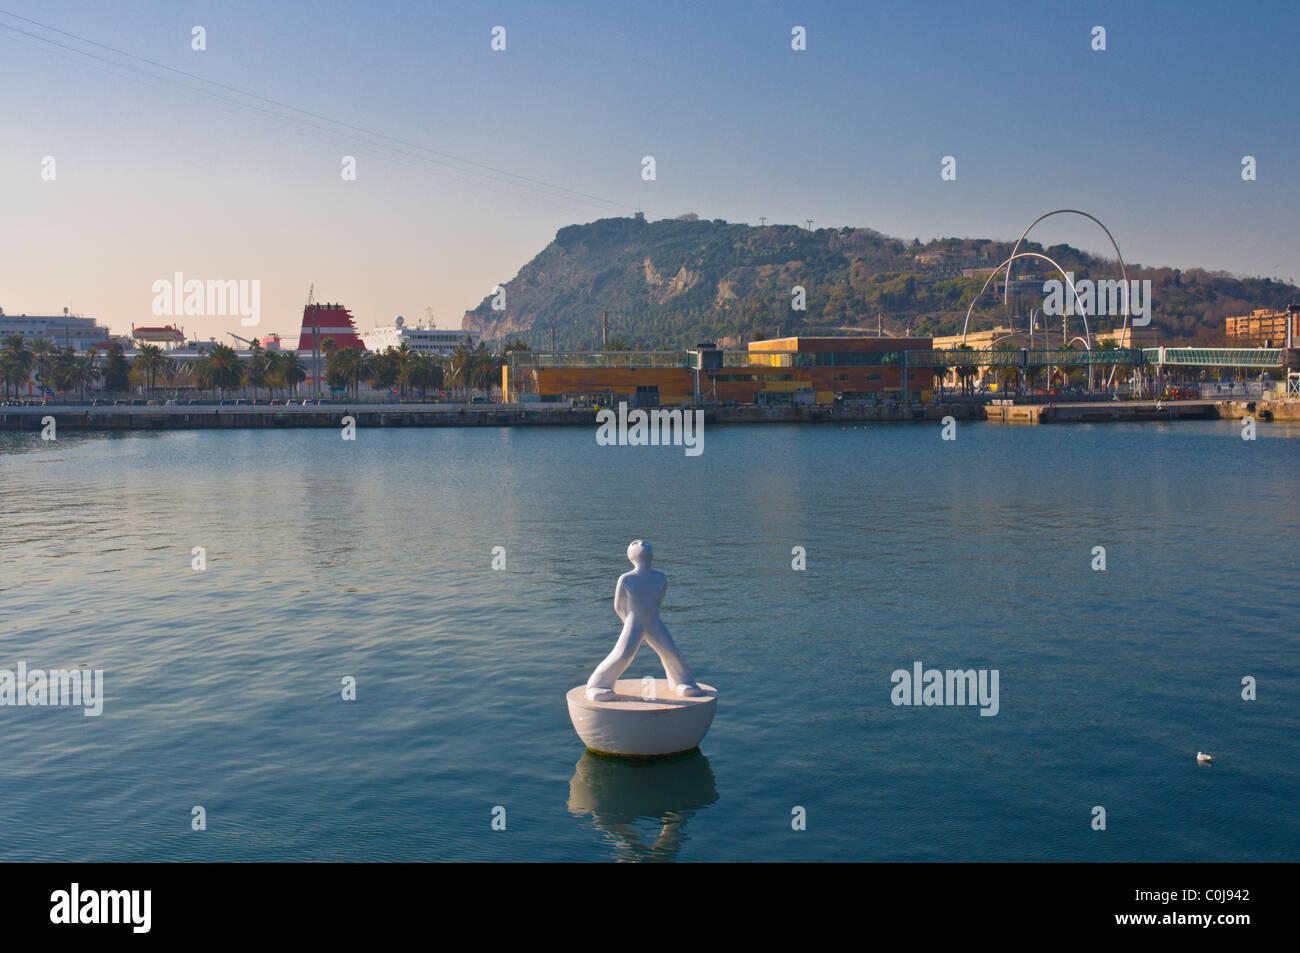 Life buoy at Port Vell central Barcelona Catalunya Spain Europe - Stock Image